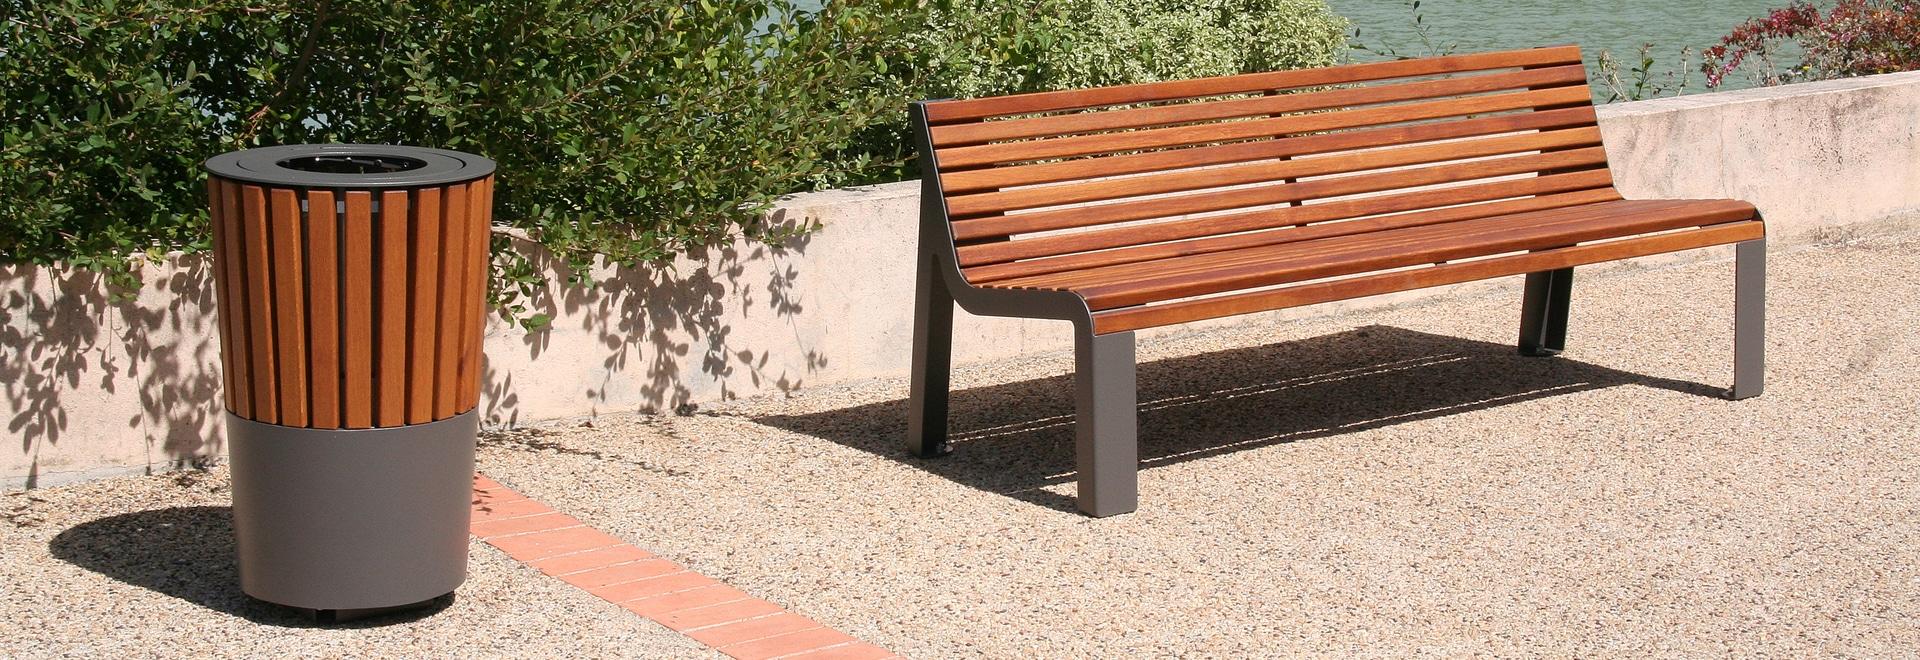 XYLON Bench